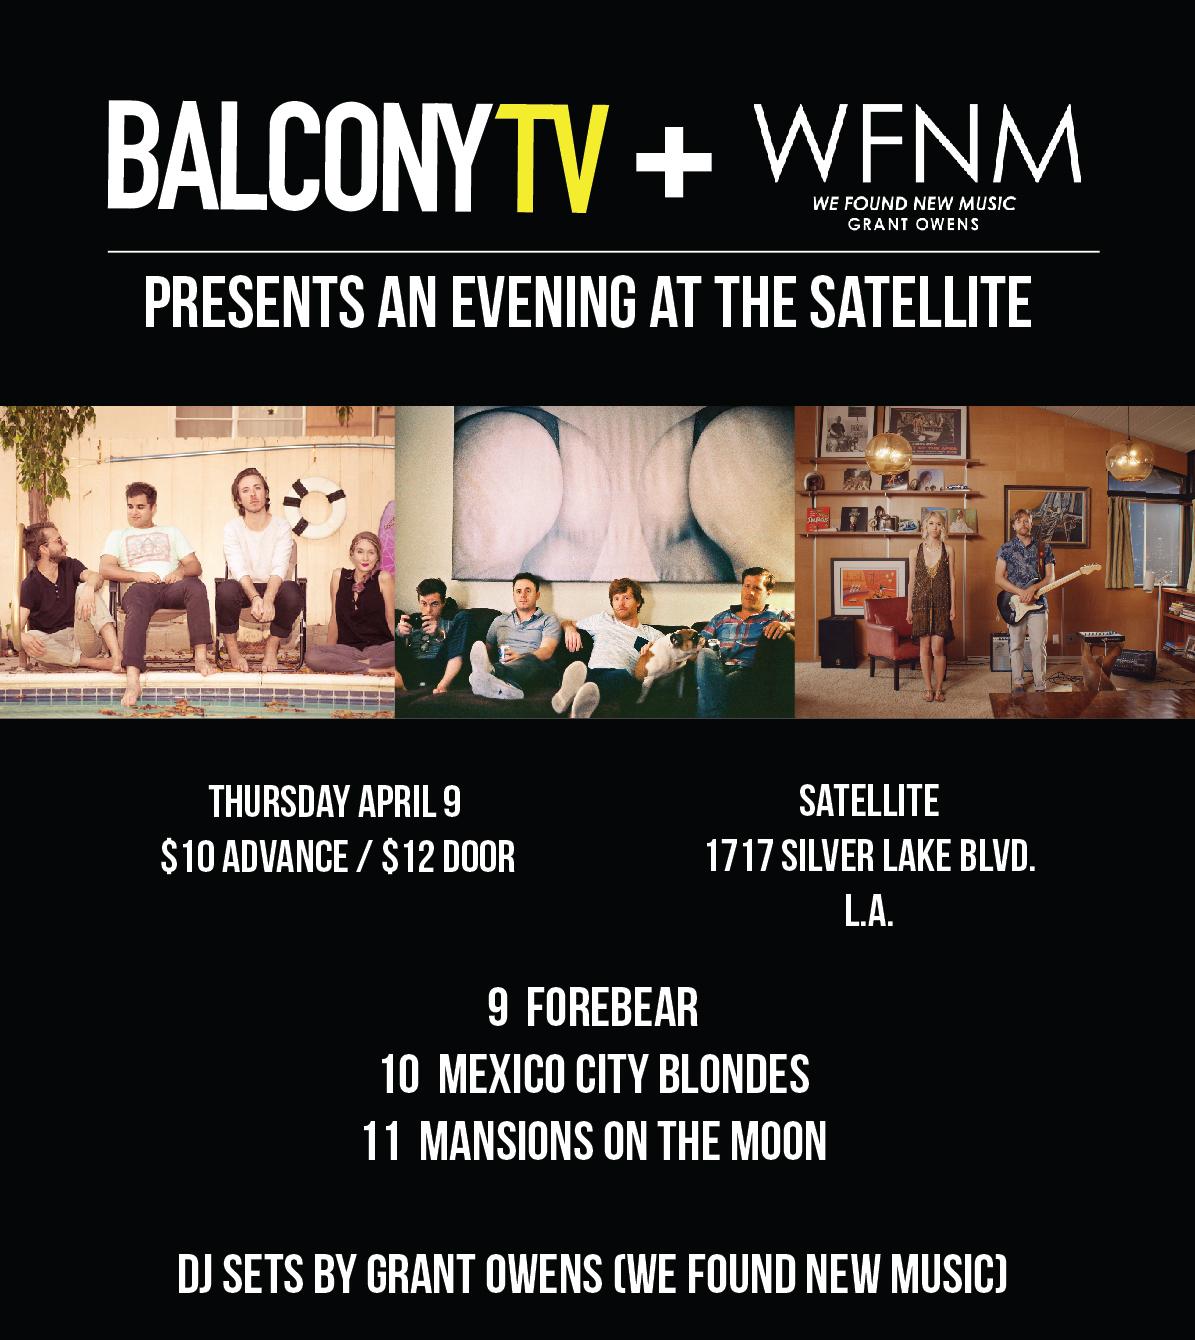 BalconyTVCo-Present